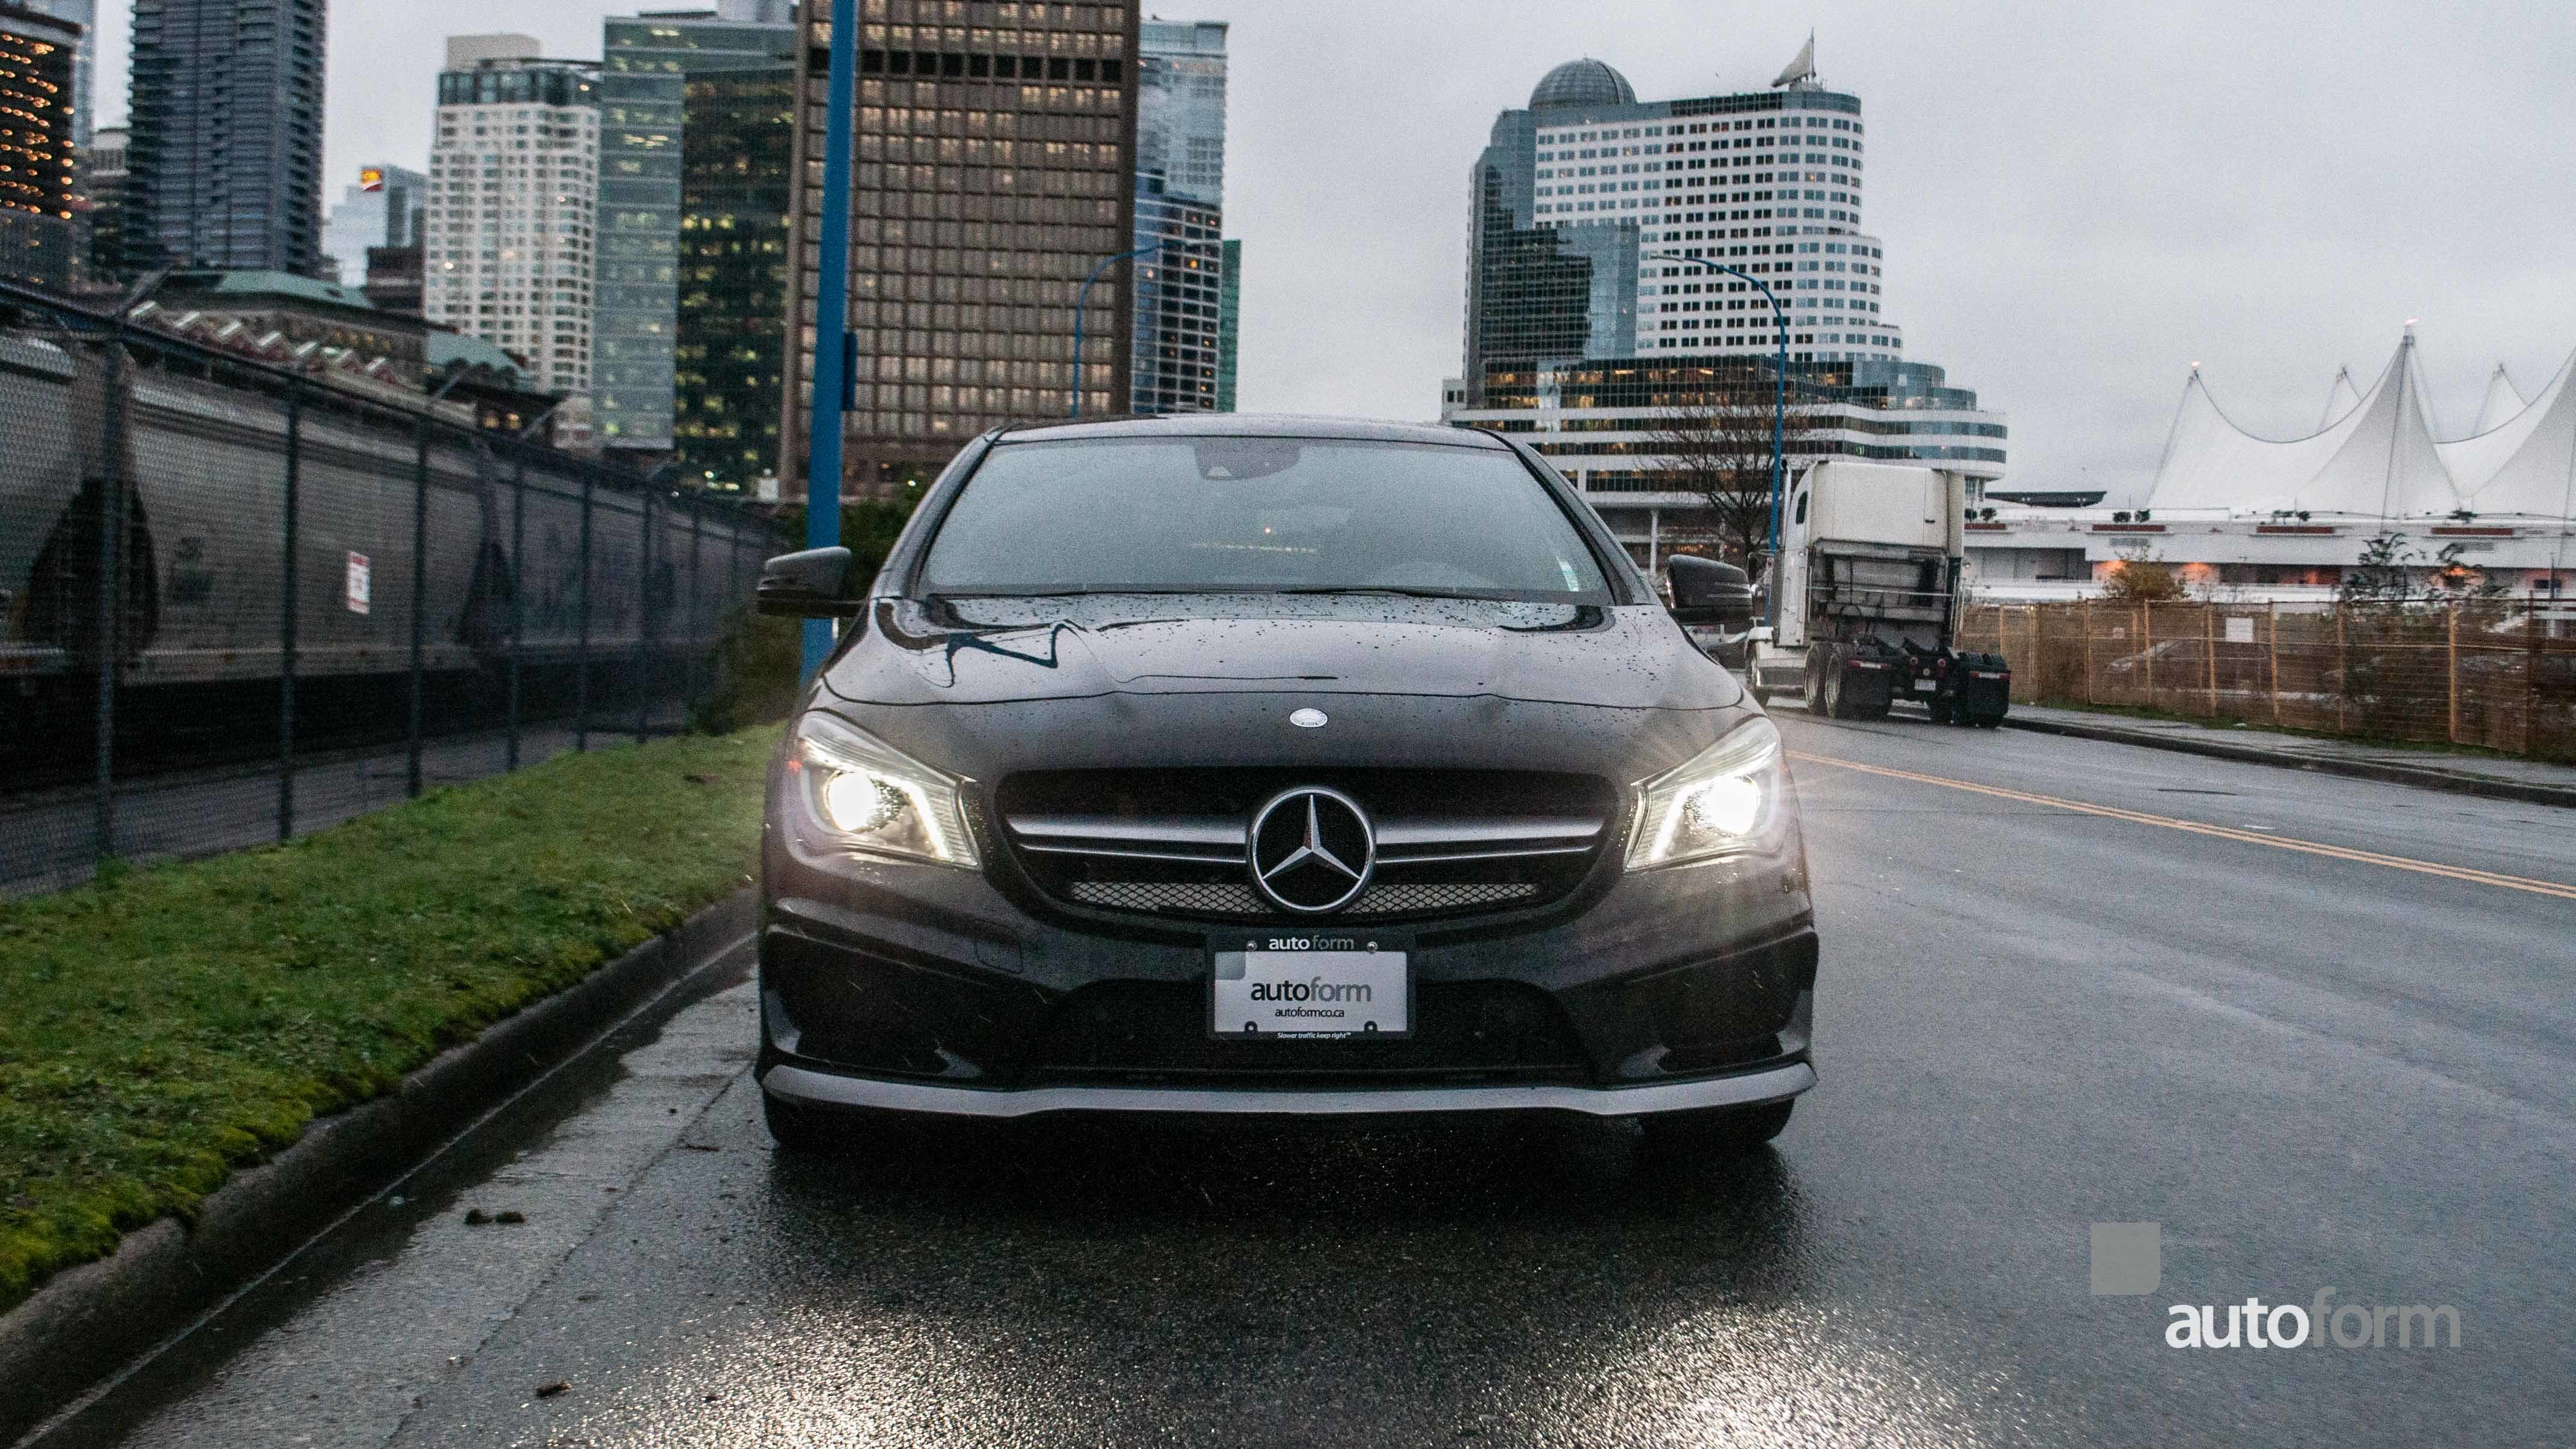 2014 mercedes benz cla45 amg 4matic autoform for Mercedes benz dealer in bakersfield ca